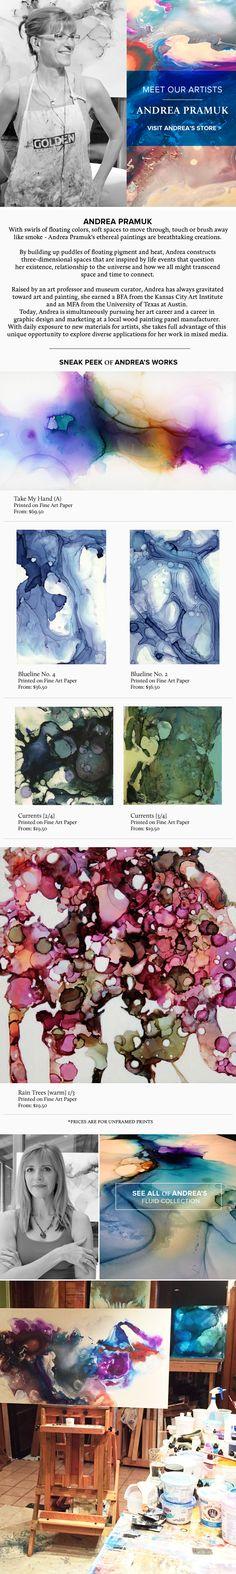 Liquid Color - A Breathtaking Collection by Andrea Pramuk @apramuk @artfullywalls #austinart #workingartist @ampersand_art